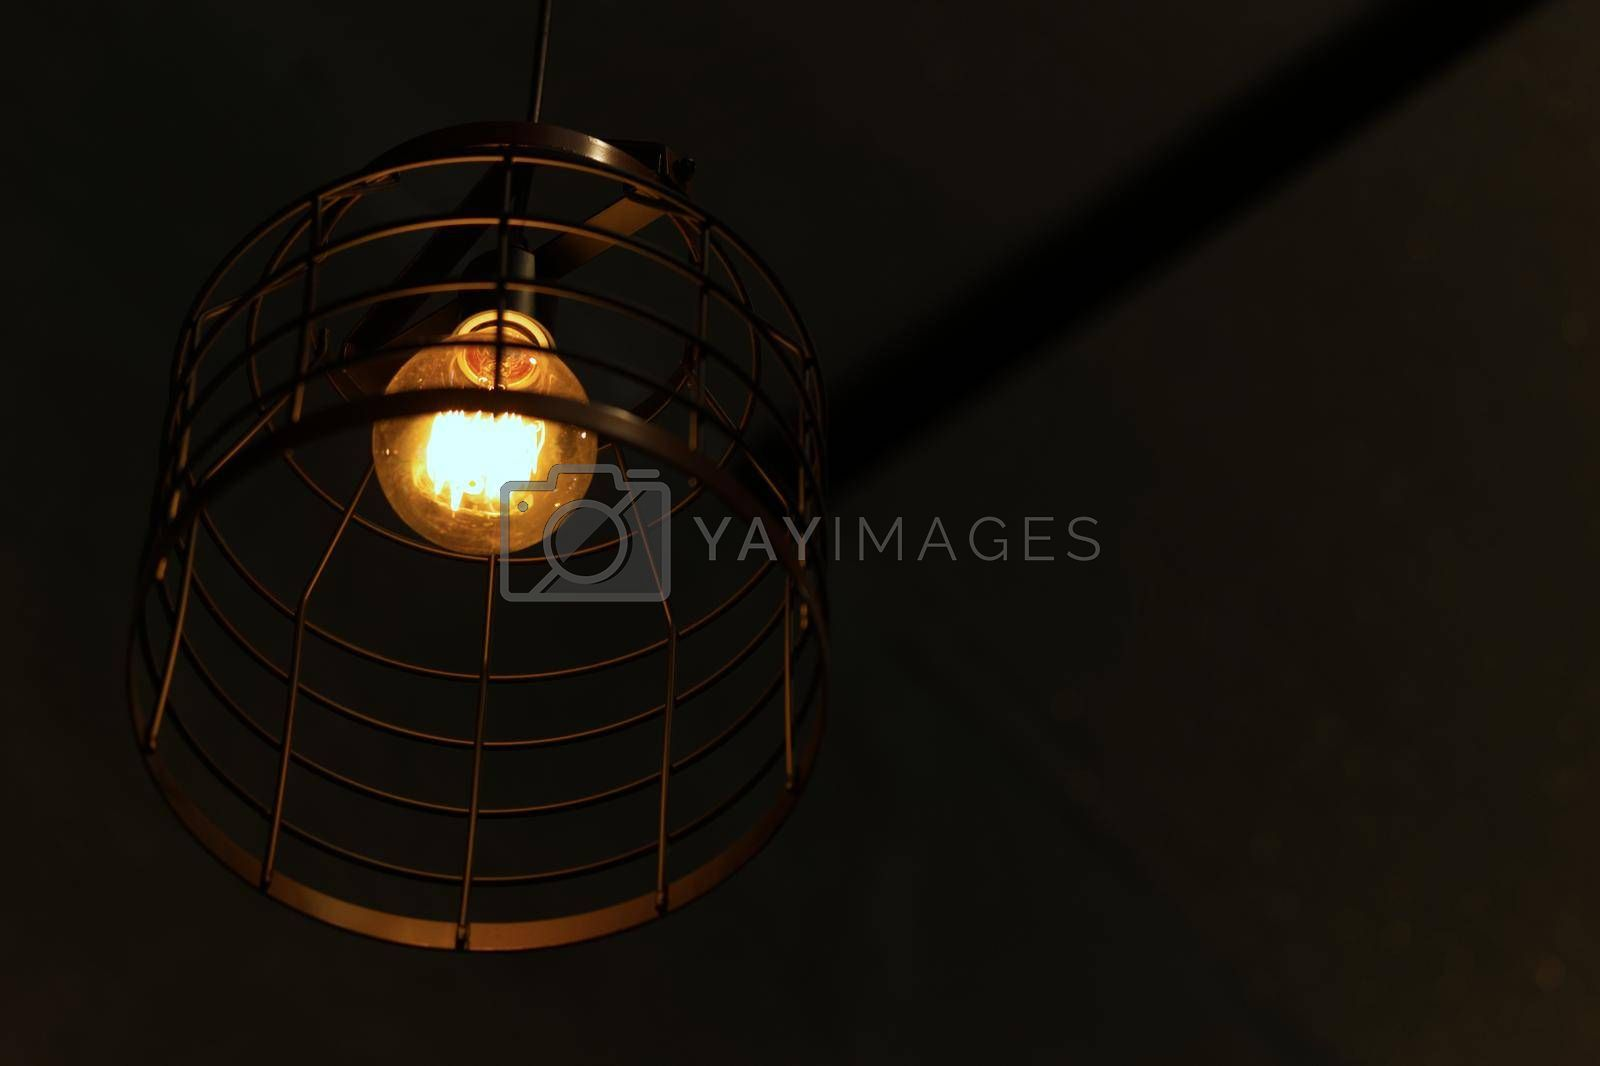 Vintage style light bulbs in restaurants